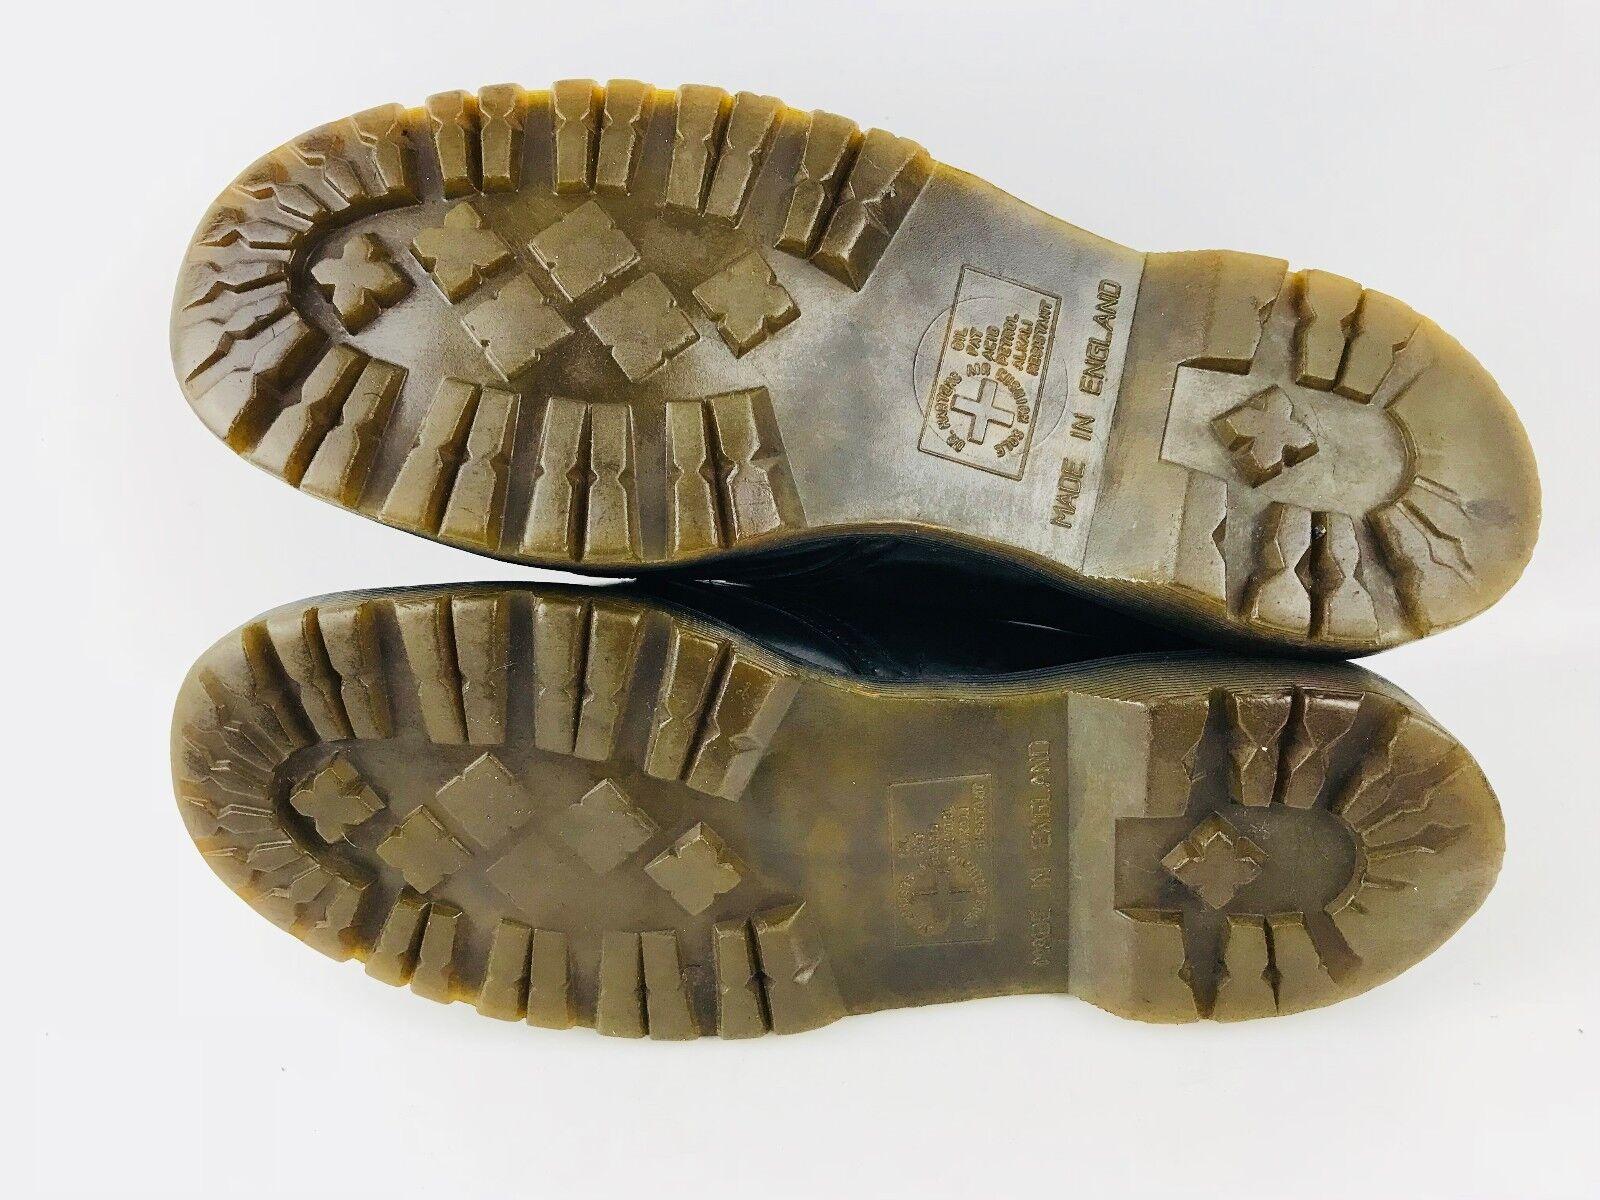 Dr. Martens England Black EU.42.5-Women's Shoe Men's US.9.5 UK.9/ EU.42.5-Women's Black US.11 EU.41.5 127ab5